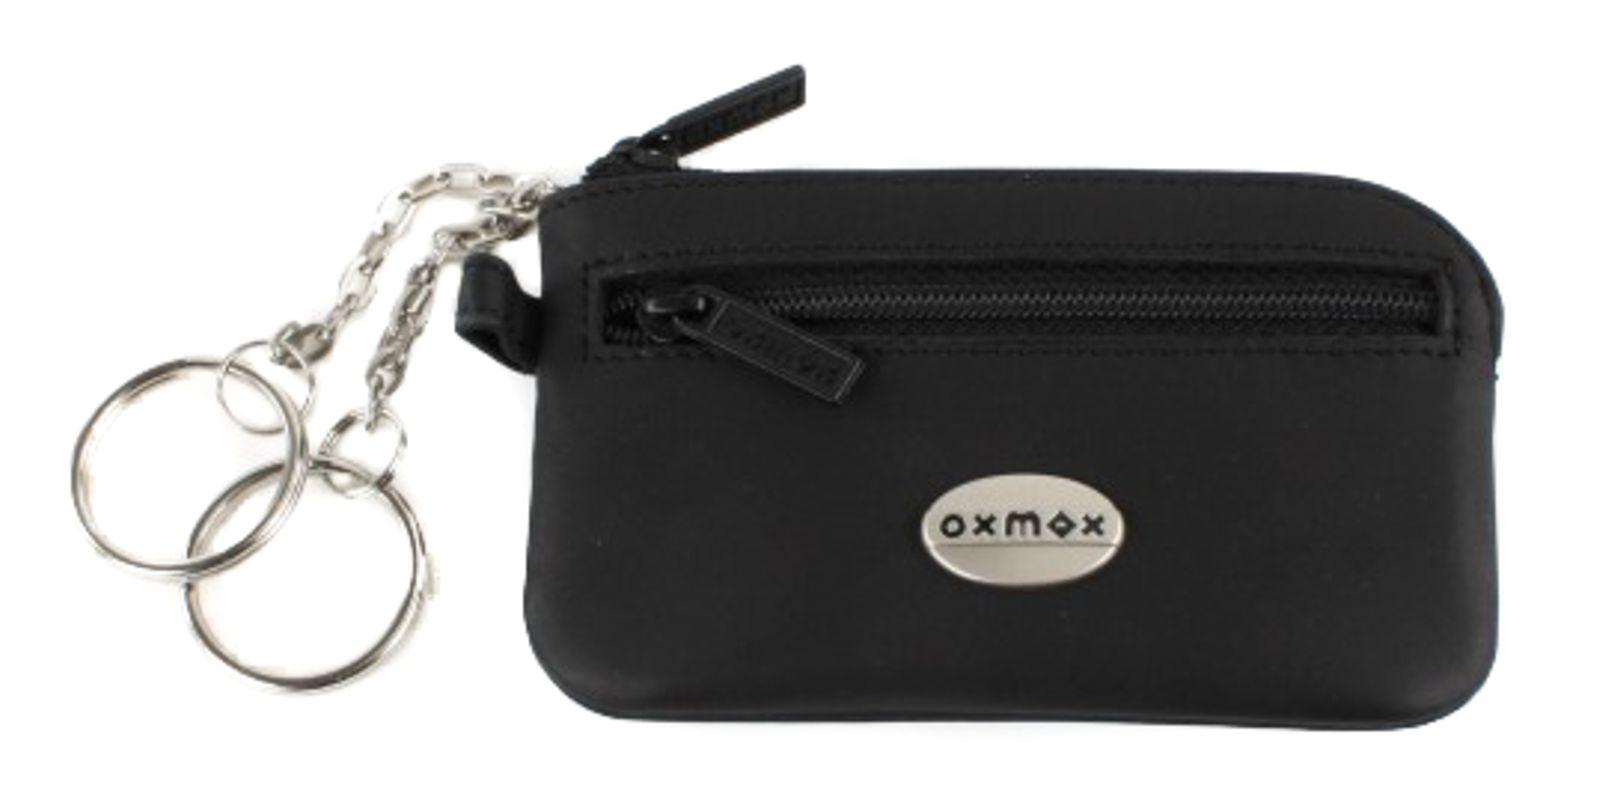 oxmox Leather Keyholder Black